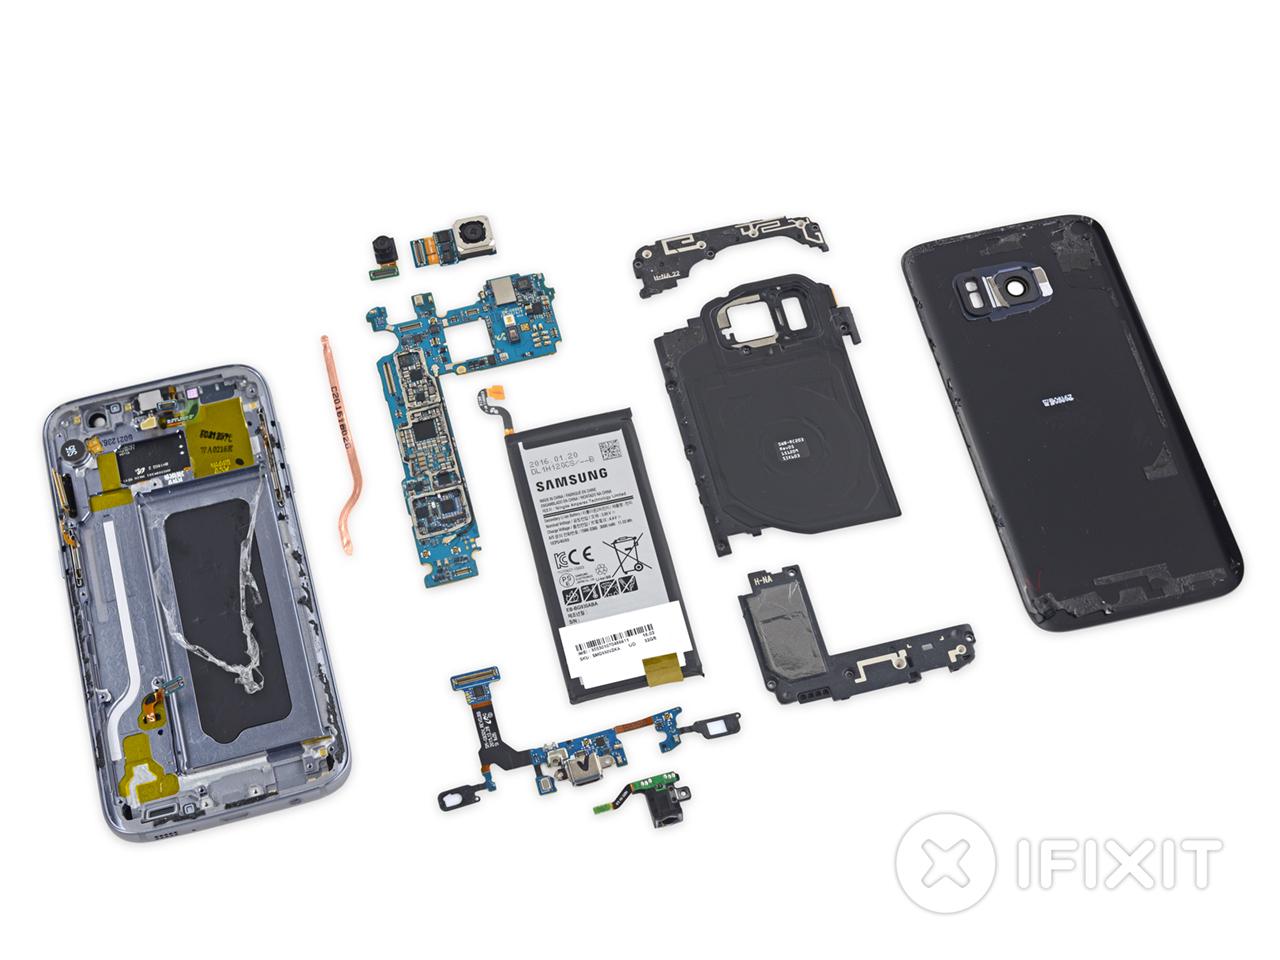 Samsung телефон ремонт своими руками фото 920